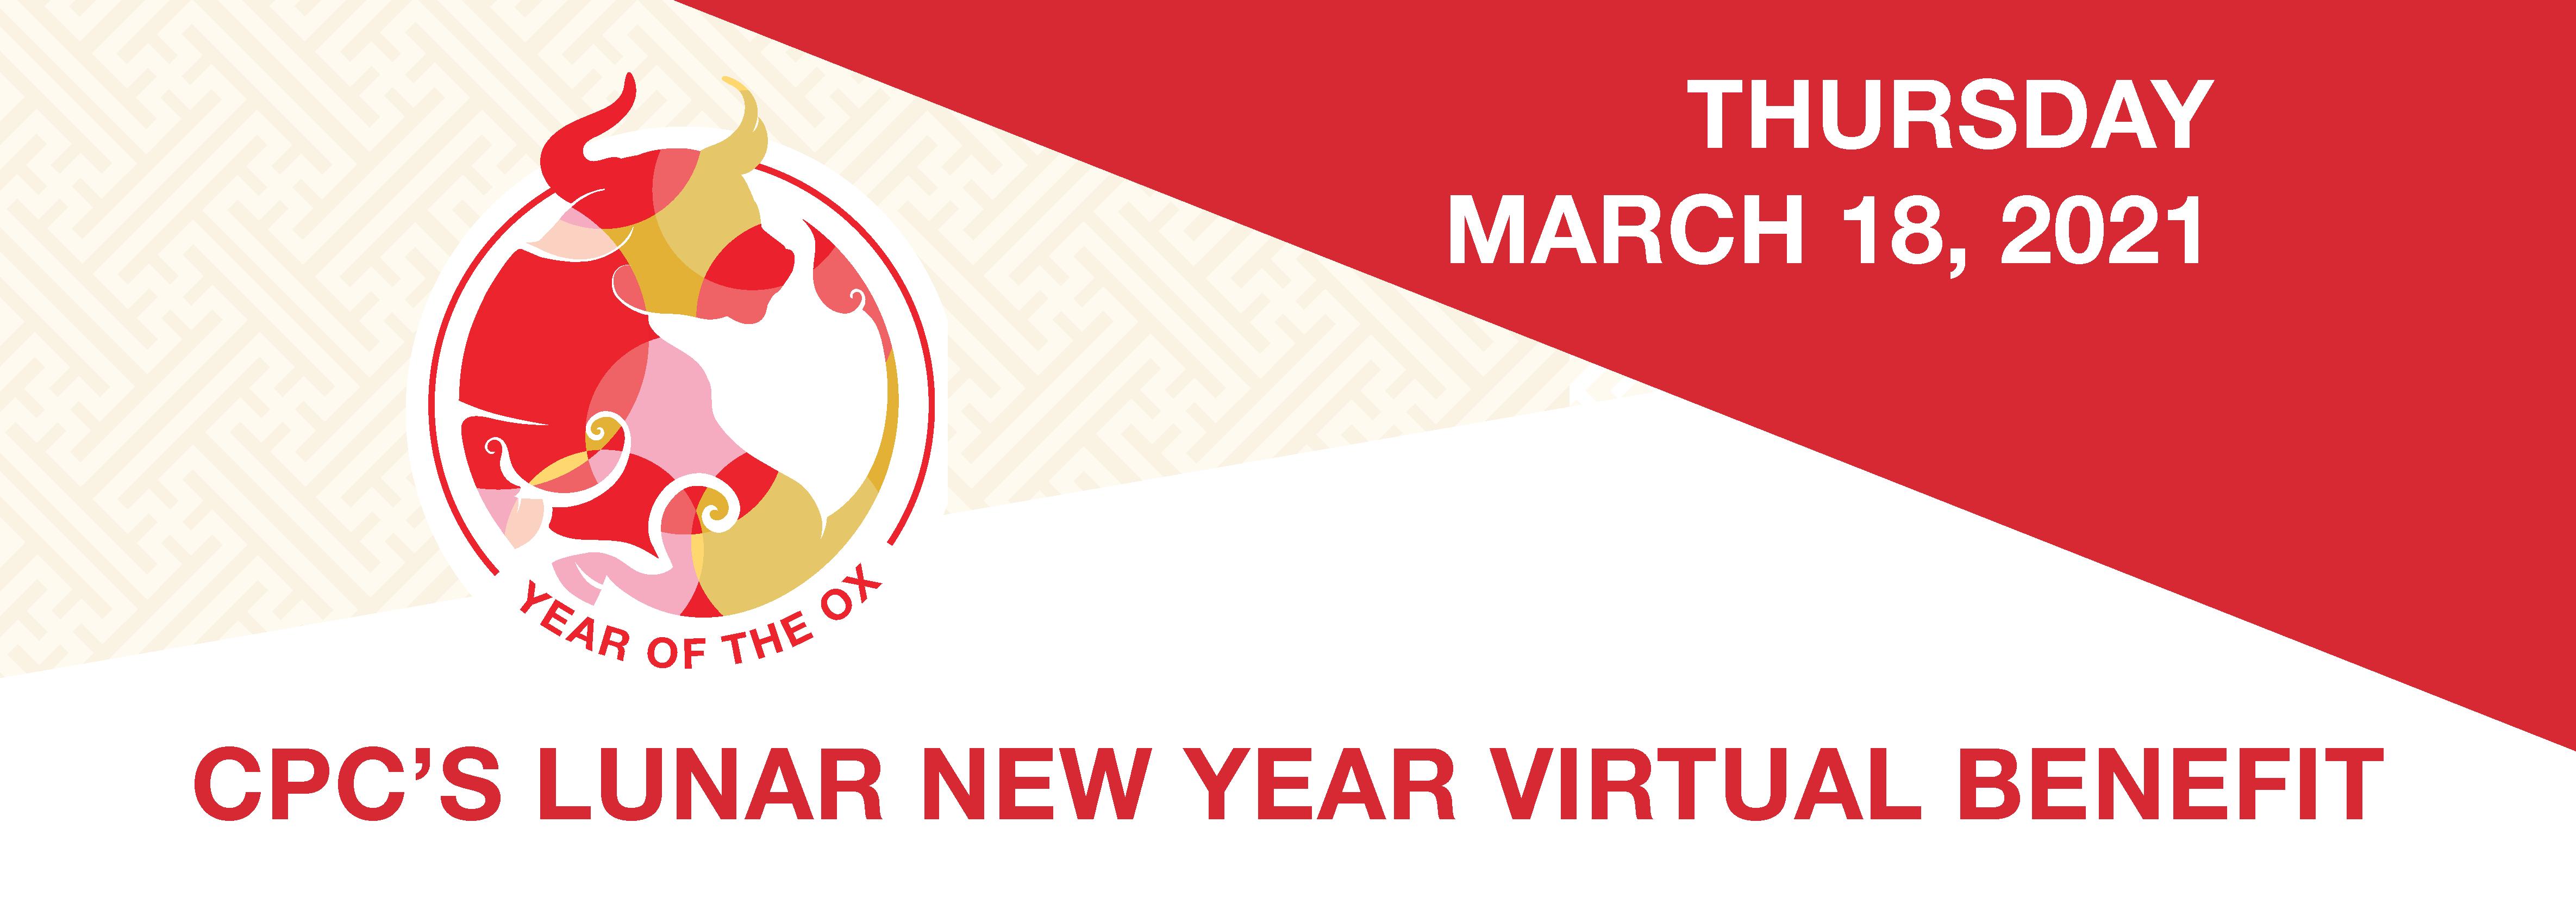 Lunar New Year Virtual Benefit Thursday March 18th, 2021